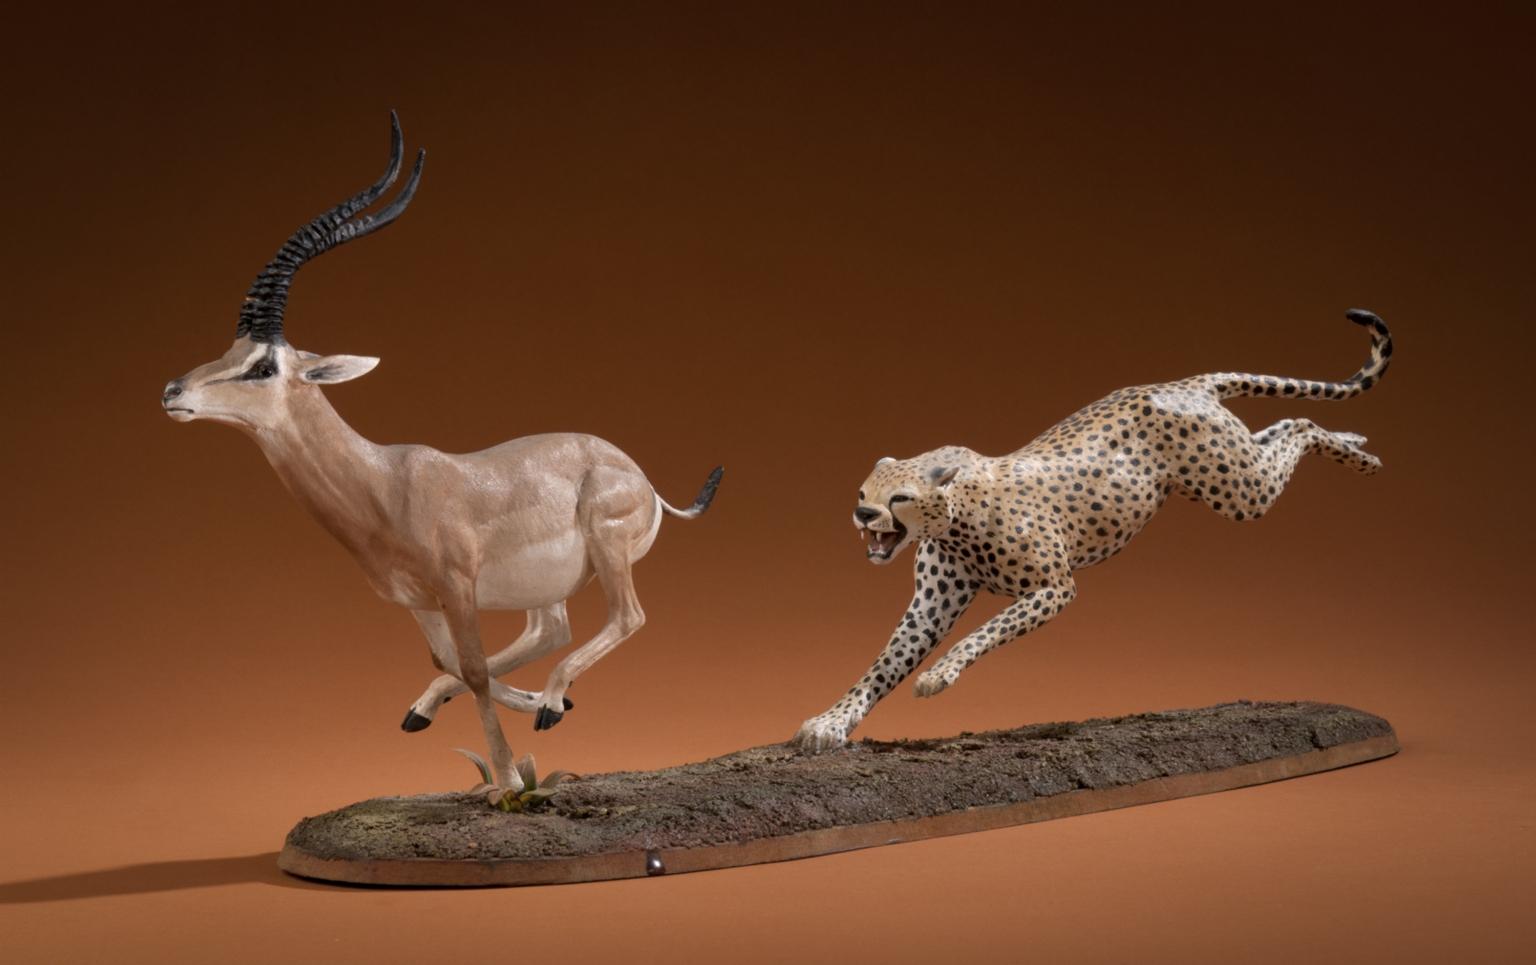 Cheetah and Grant's Gazelle